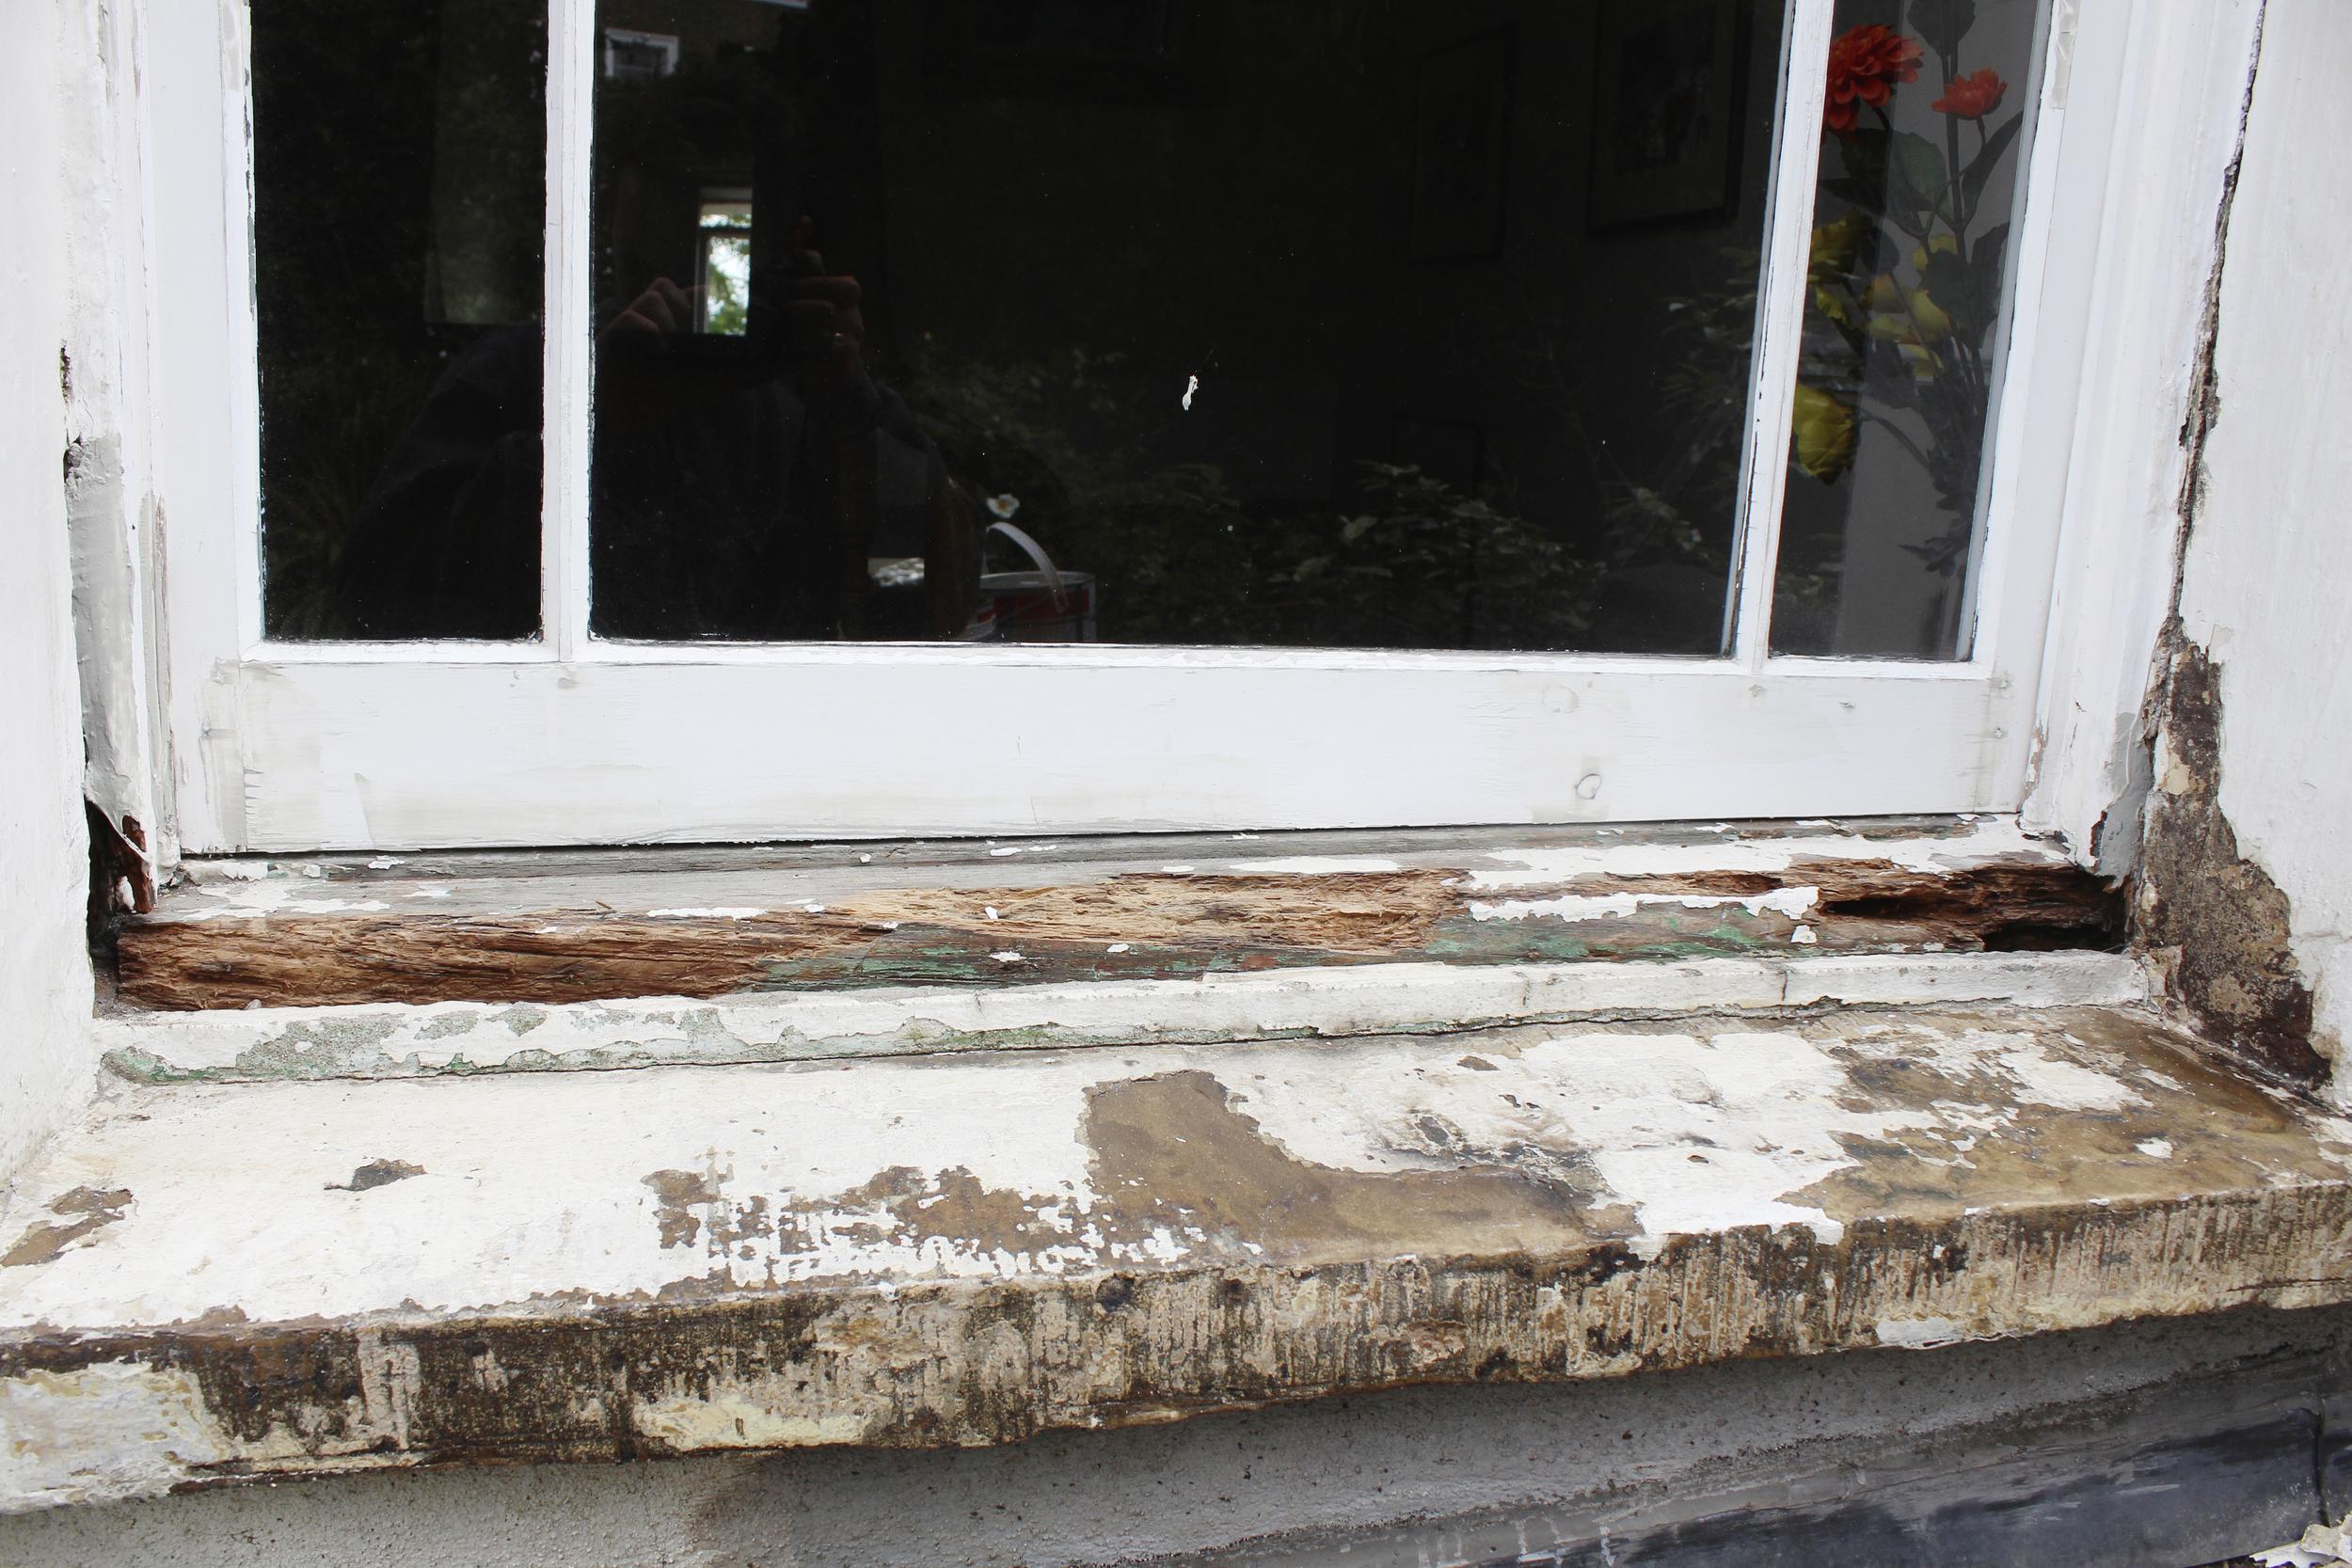 #NHRenovations #Painter #Decorator #London #Kentishtown #Kentish #Listedbuilding #Windows #OldMasonry #Keim #Keimminerals #Exterior #Building #Toupret